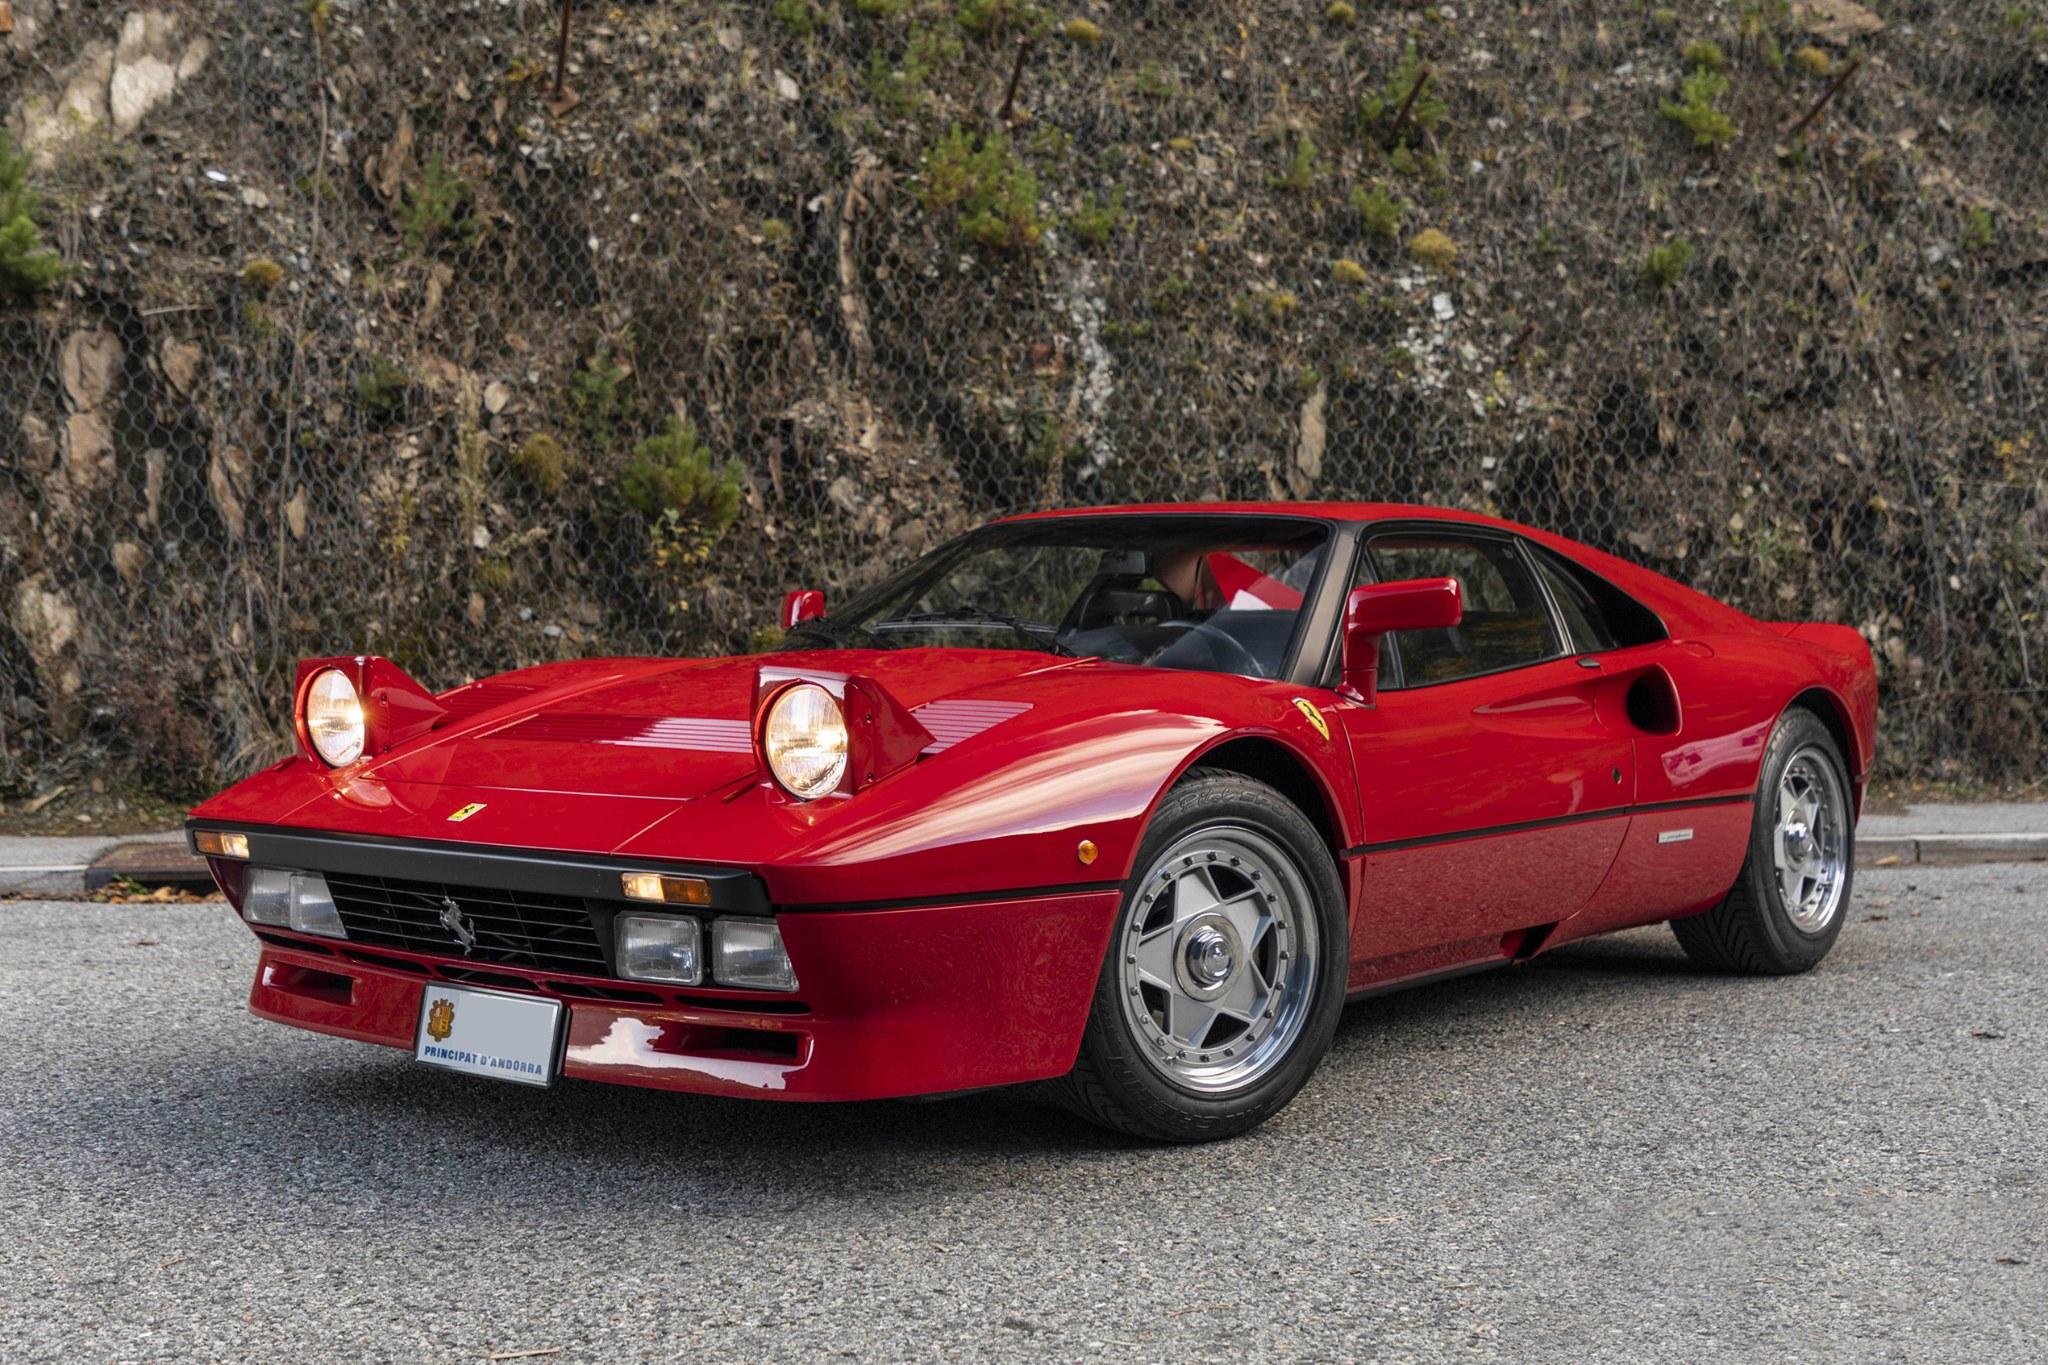 Красный Ferrari 288 GTO от Леонардо Фиораванти